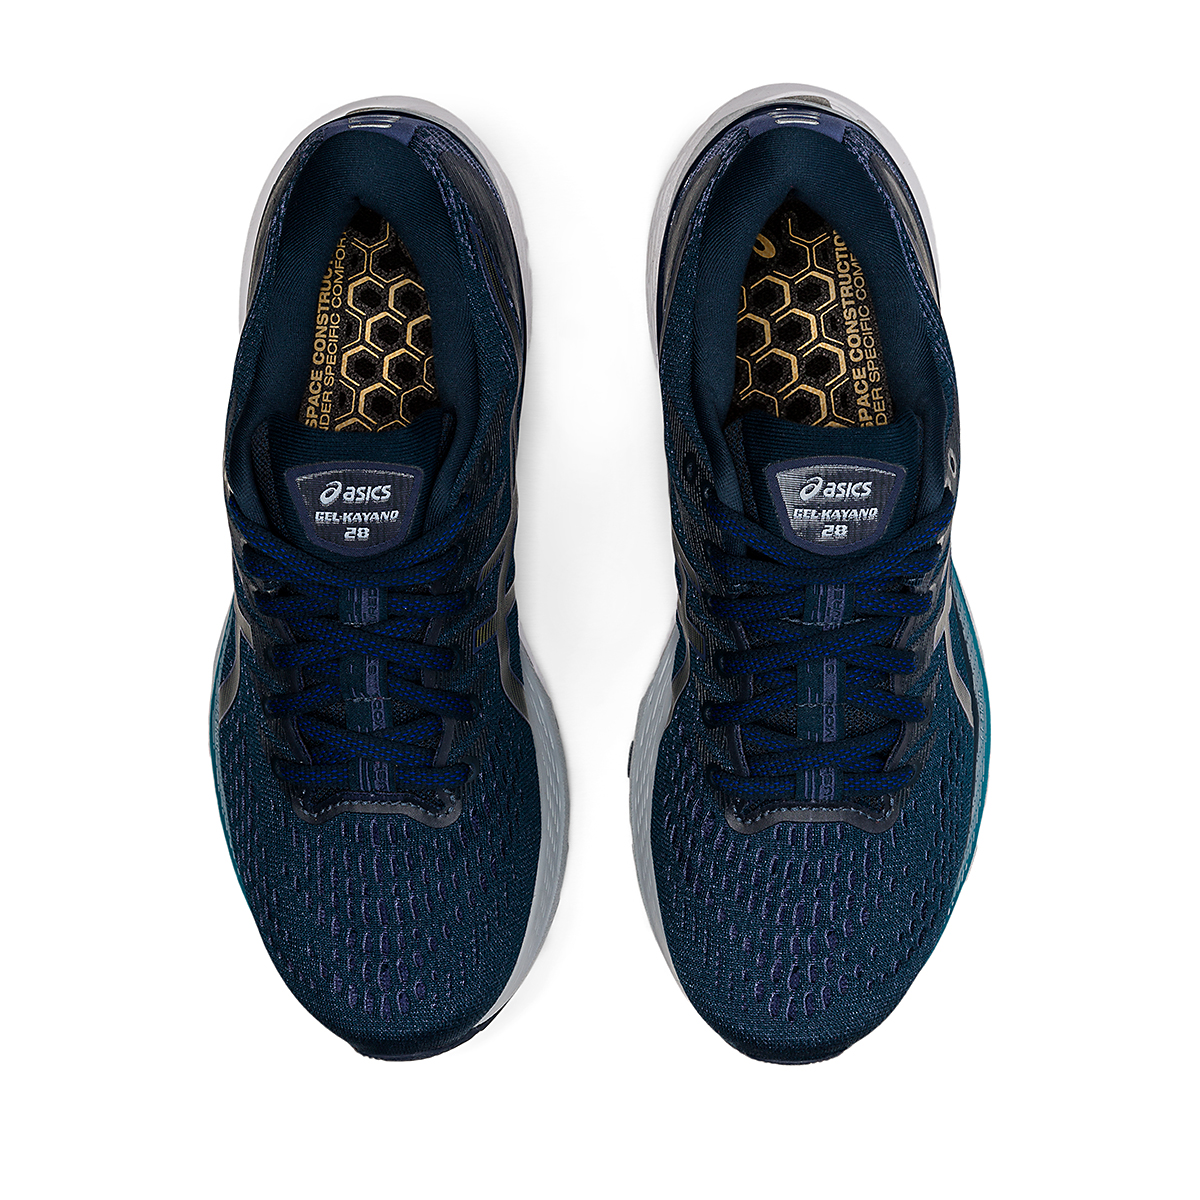 Women's Asics Gel-Kayano 28 Running Shoe - Color: French Blue/Thunder Blue - Size: 5 - Width: Wide, French Blue/Thunder Blue, large, image 5